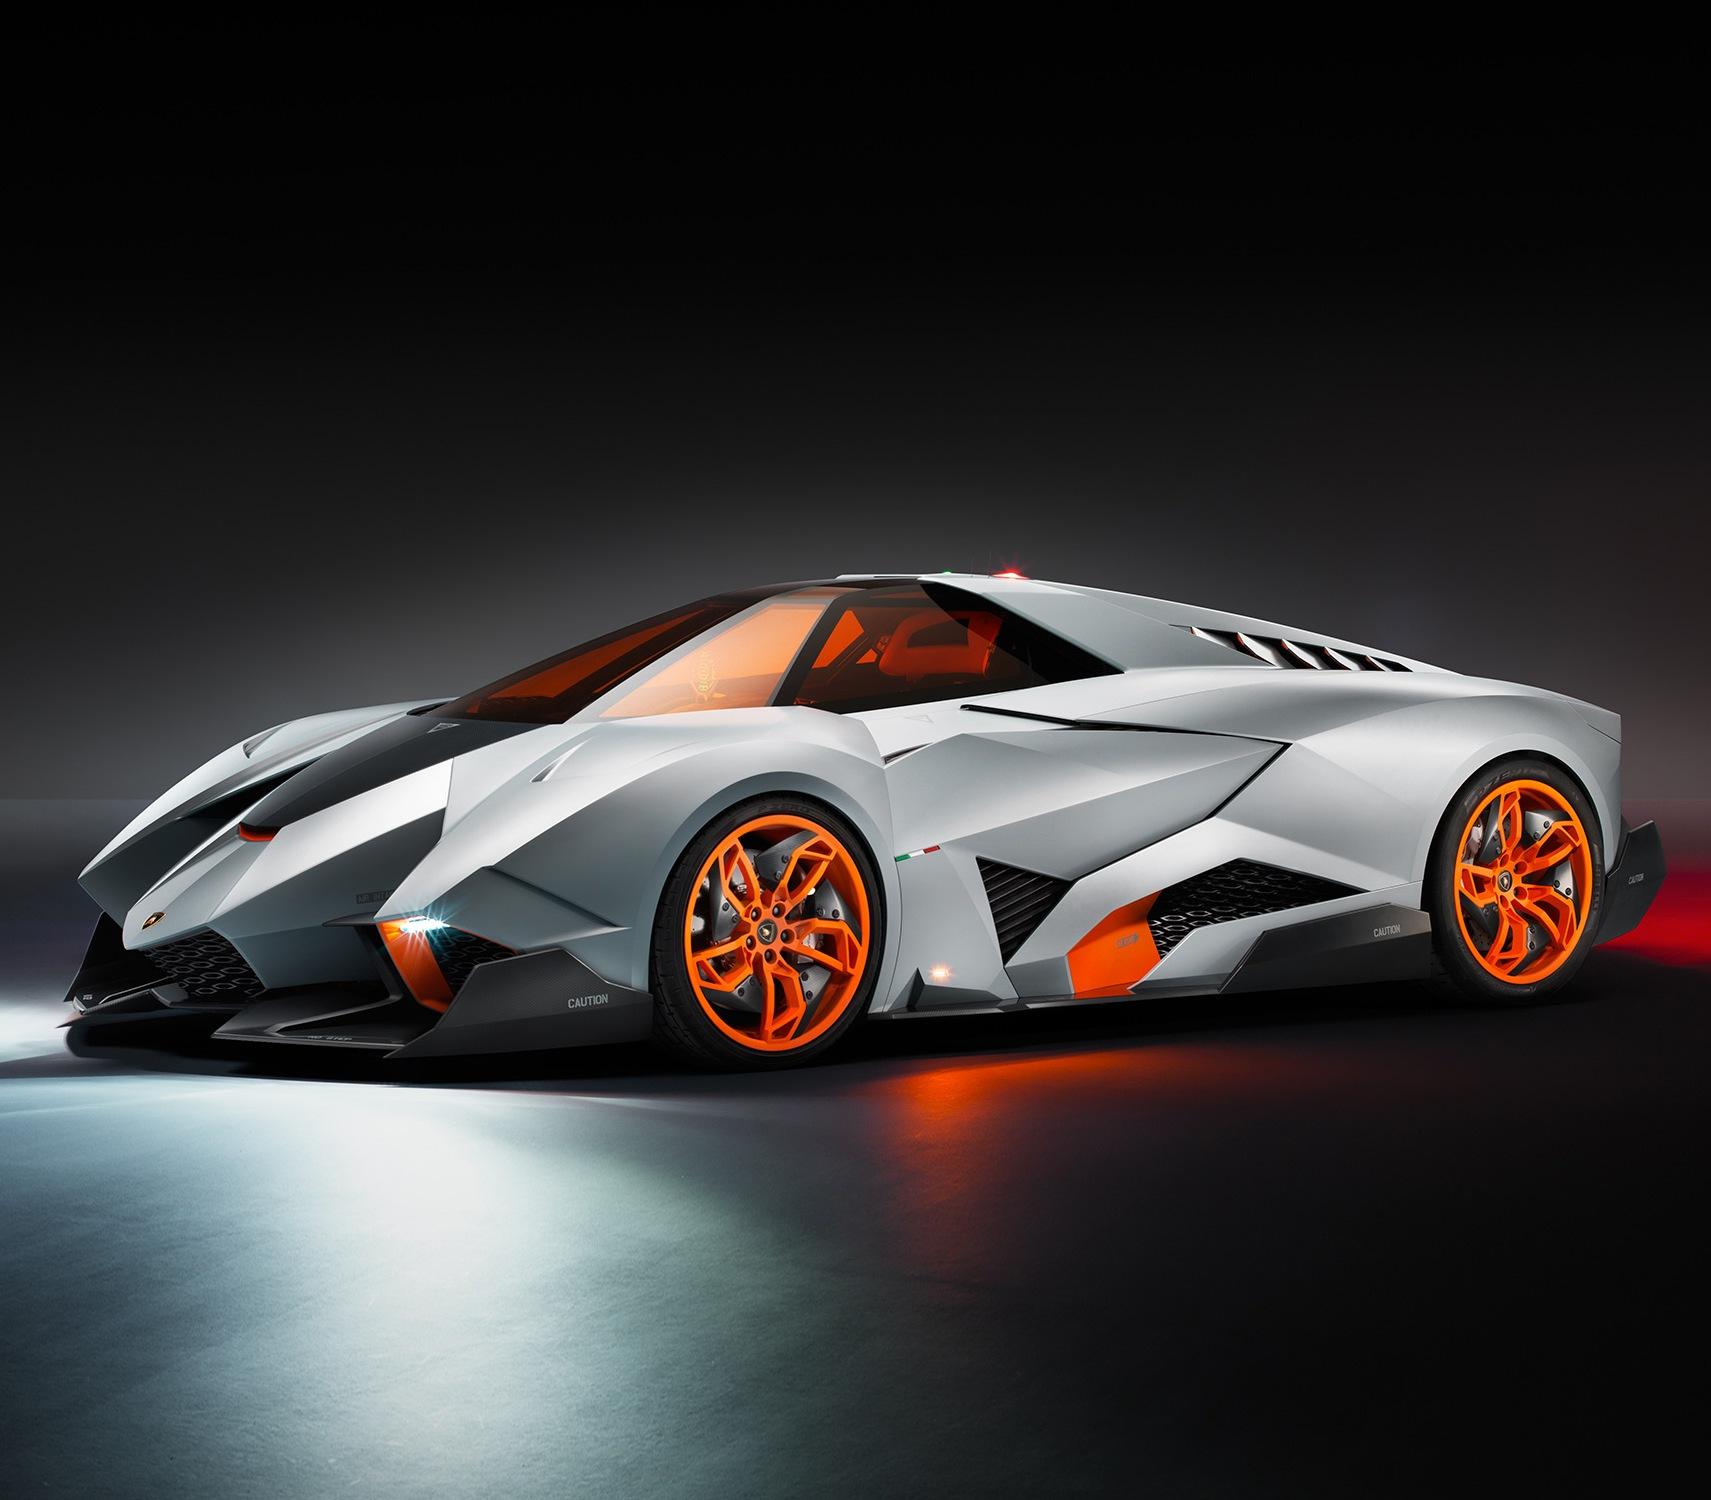 Lamborghini's Egoista Concept Car